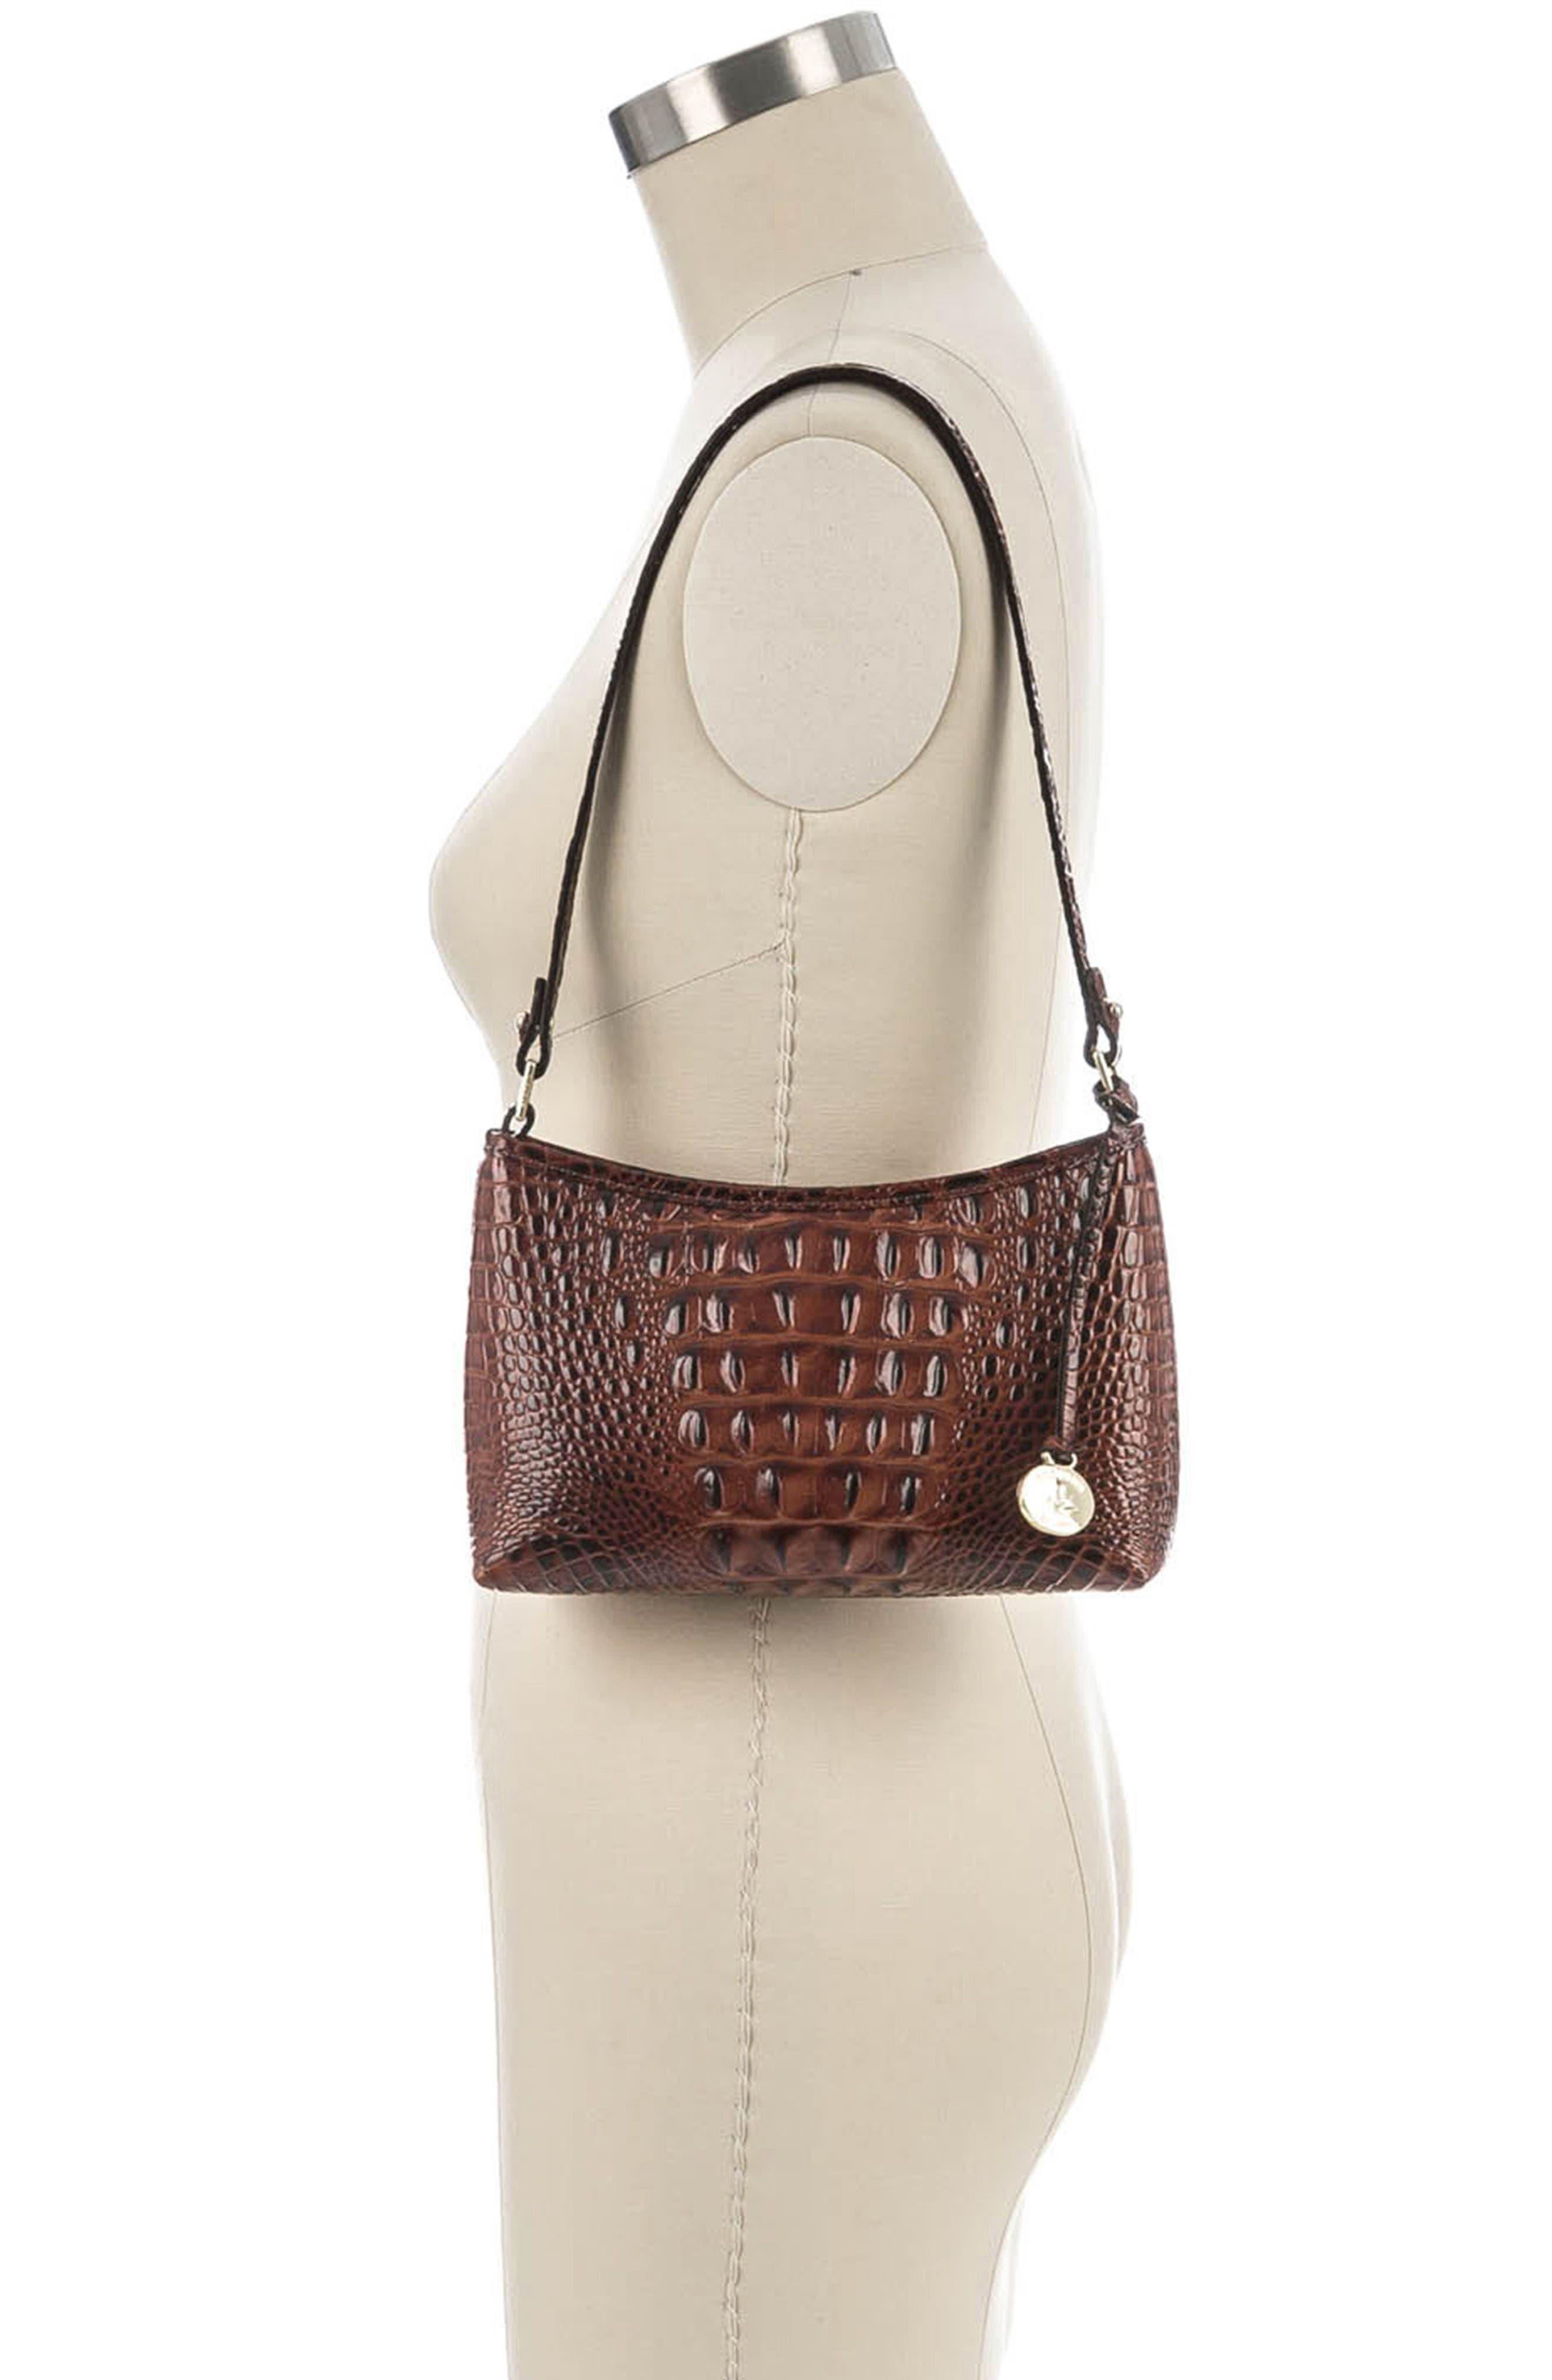 'Anytime - Mini' Convertible Handbag,                             Alternate thumbnail 41, color,